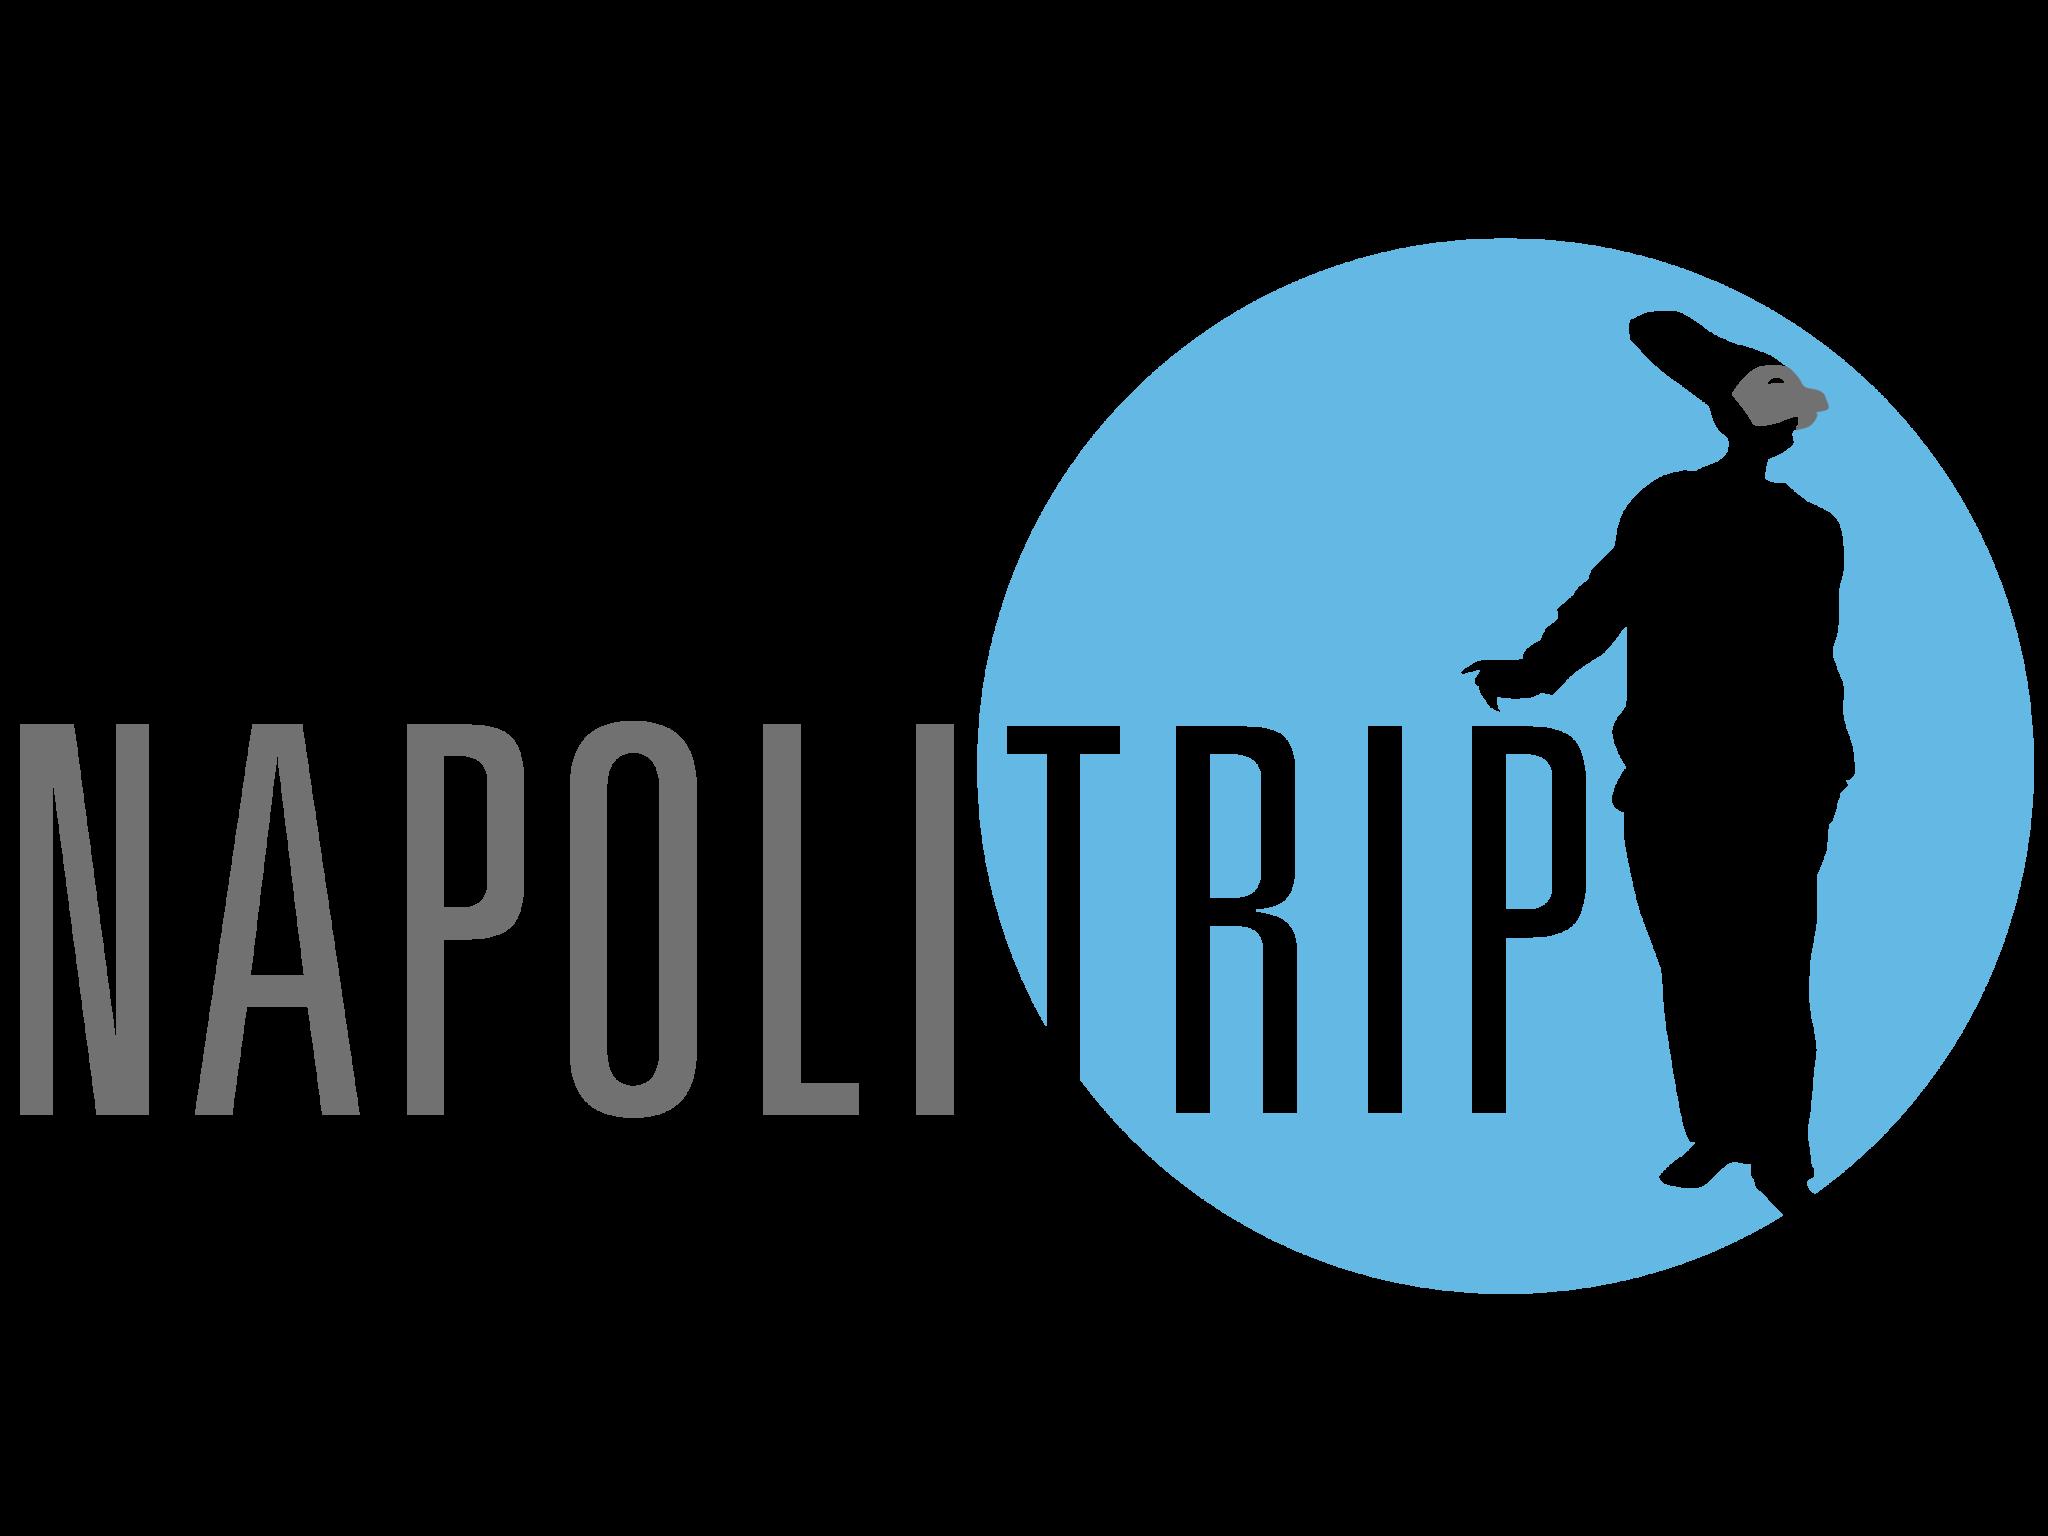 Napolitrip